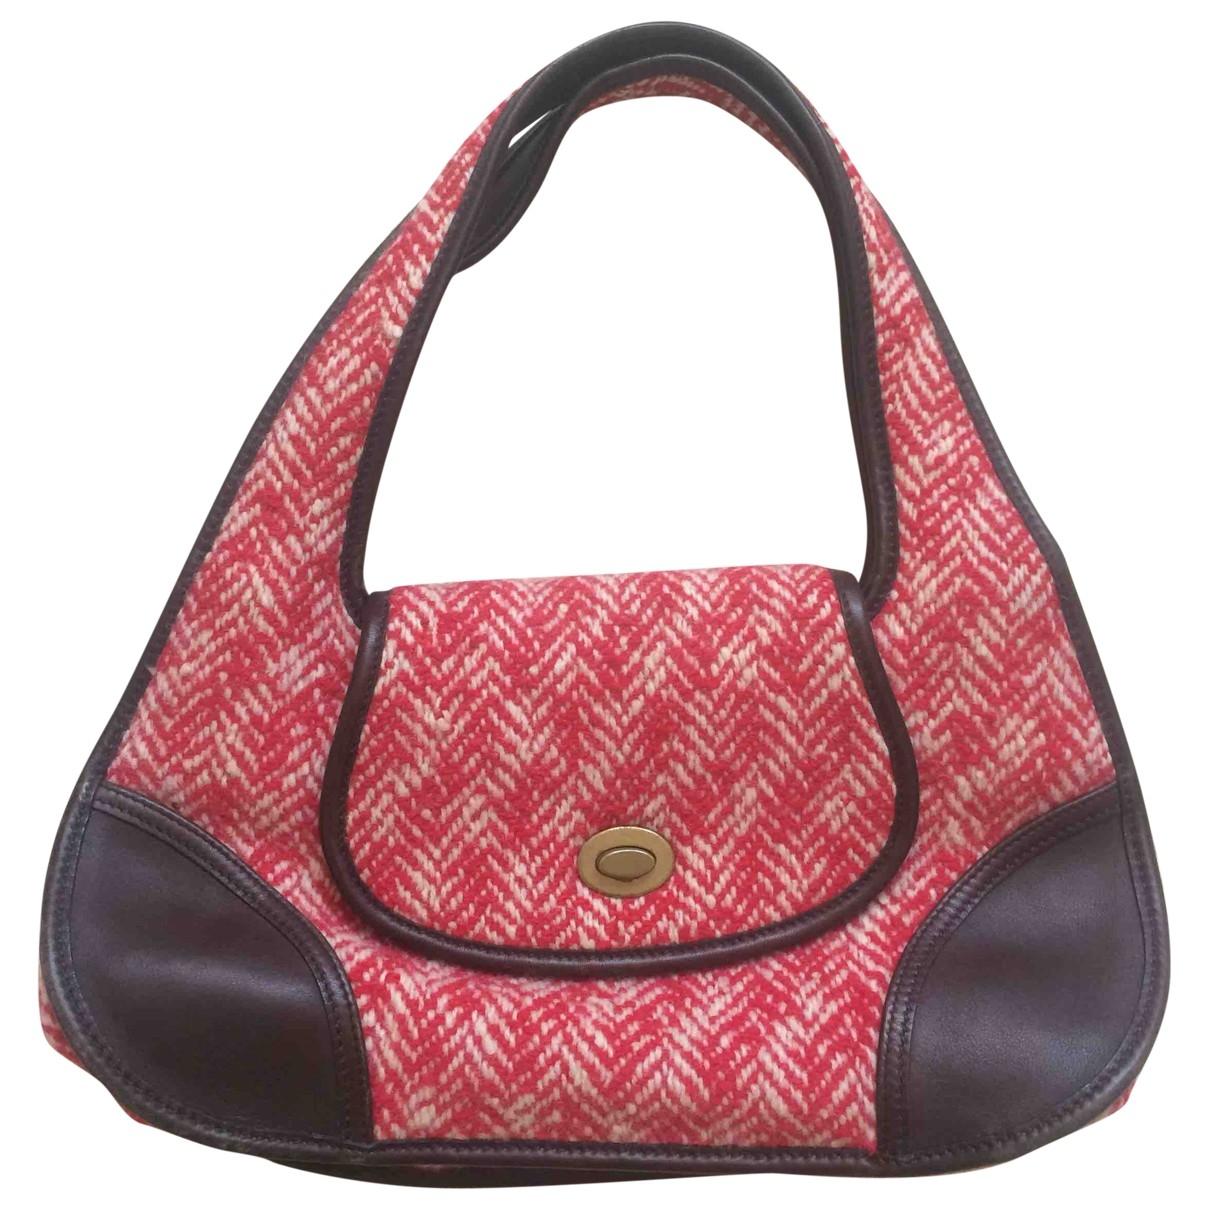 Miu Miu \N Handtasche in  Rot Wolle